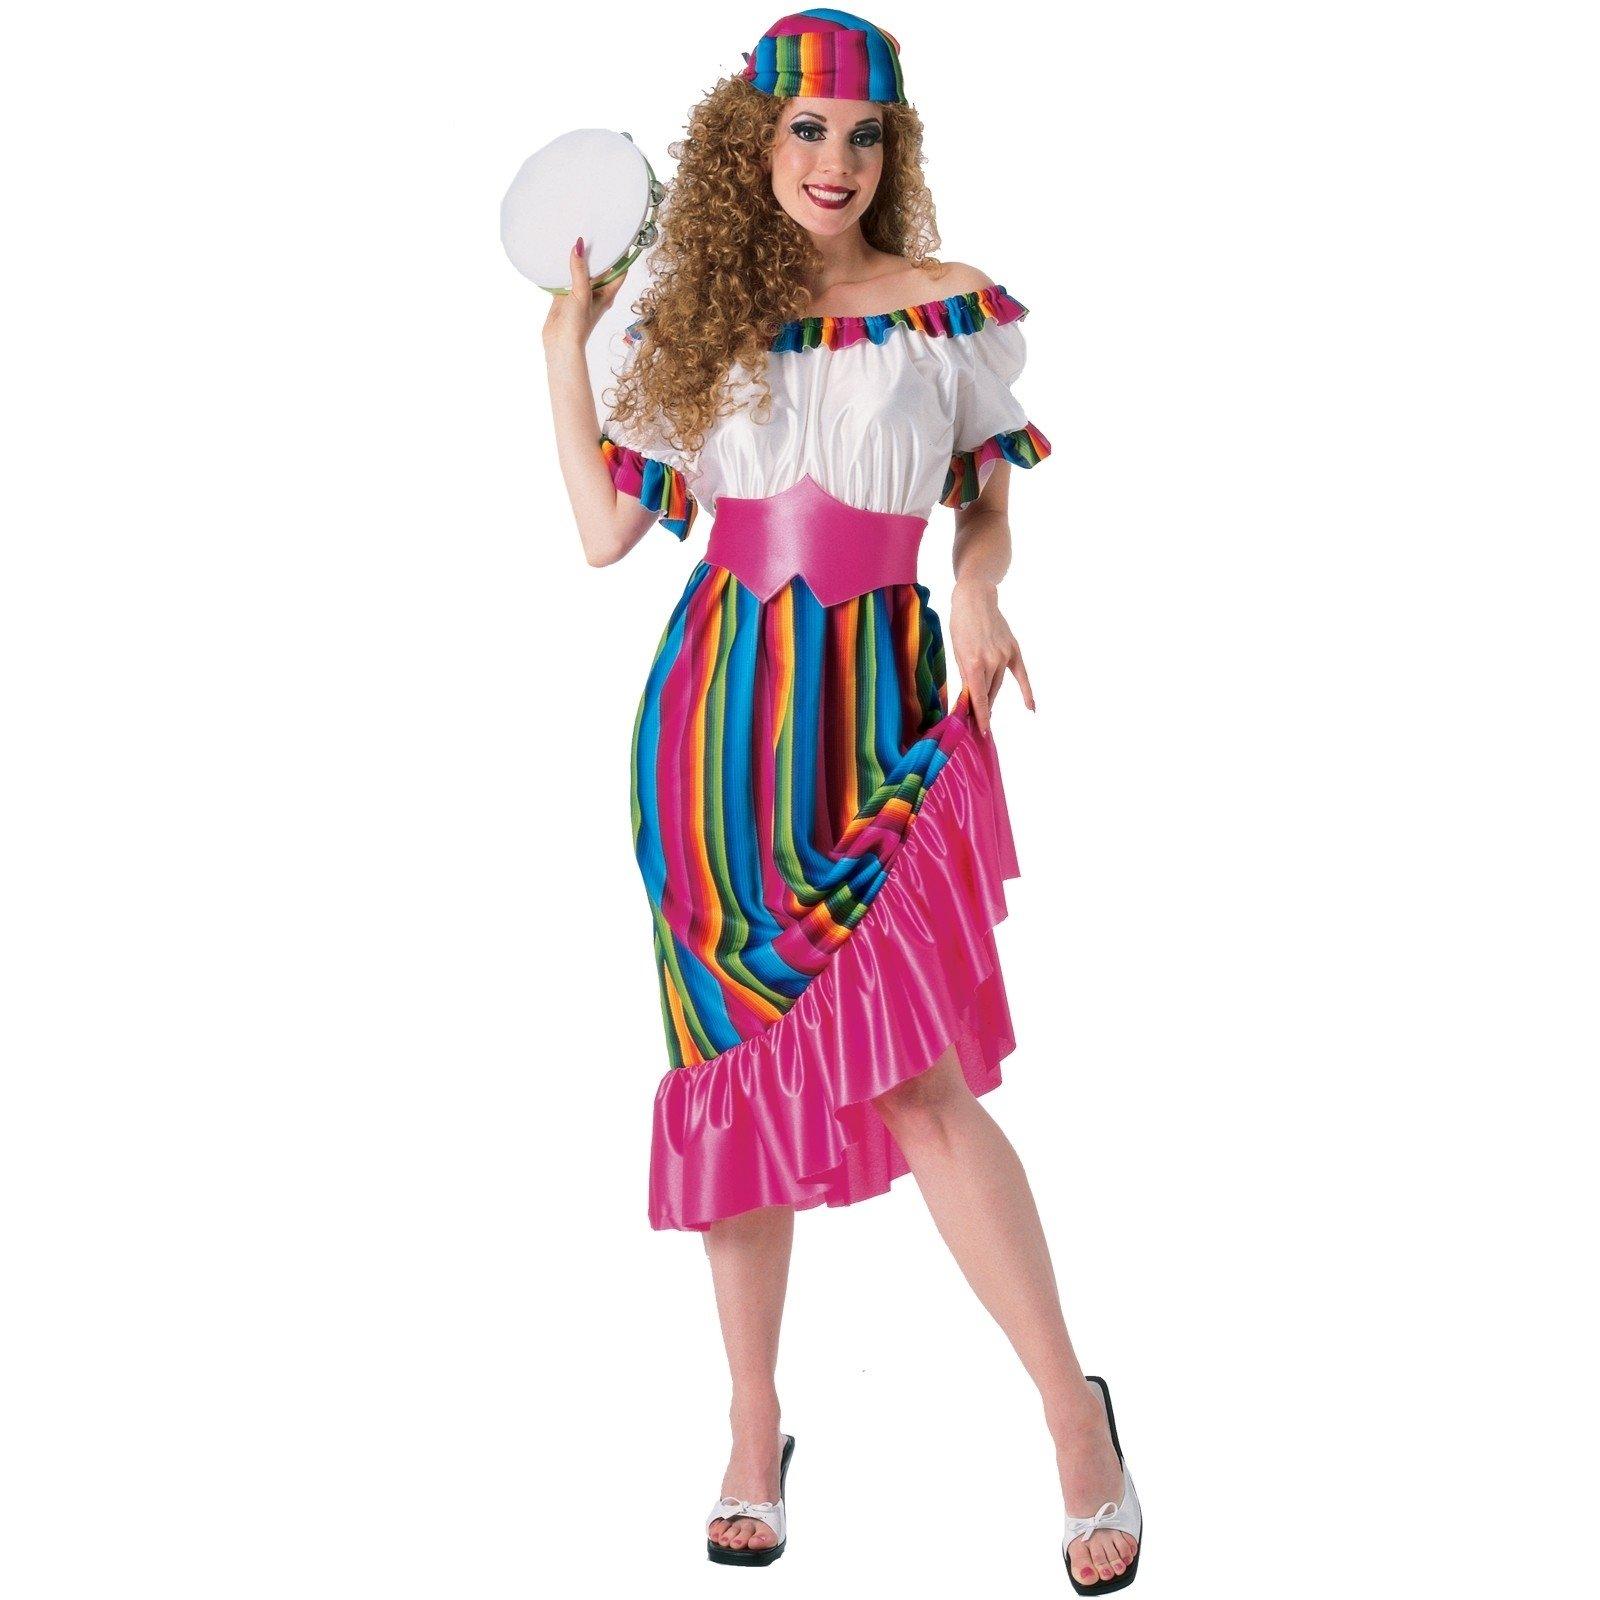 10 Attractive Cinco De Mayo Outfit Ideas cinco de mayo outfits and costumes ideas 1 2020